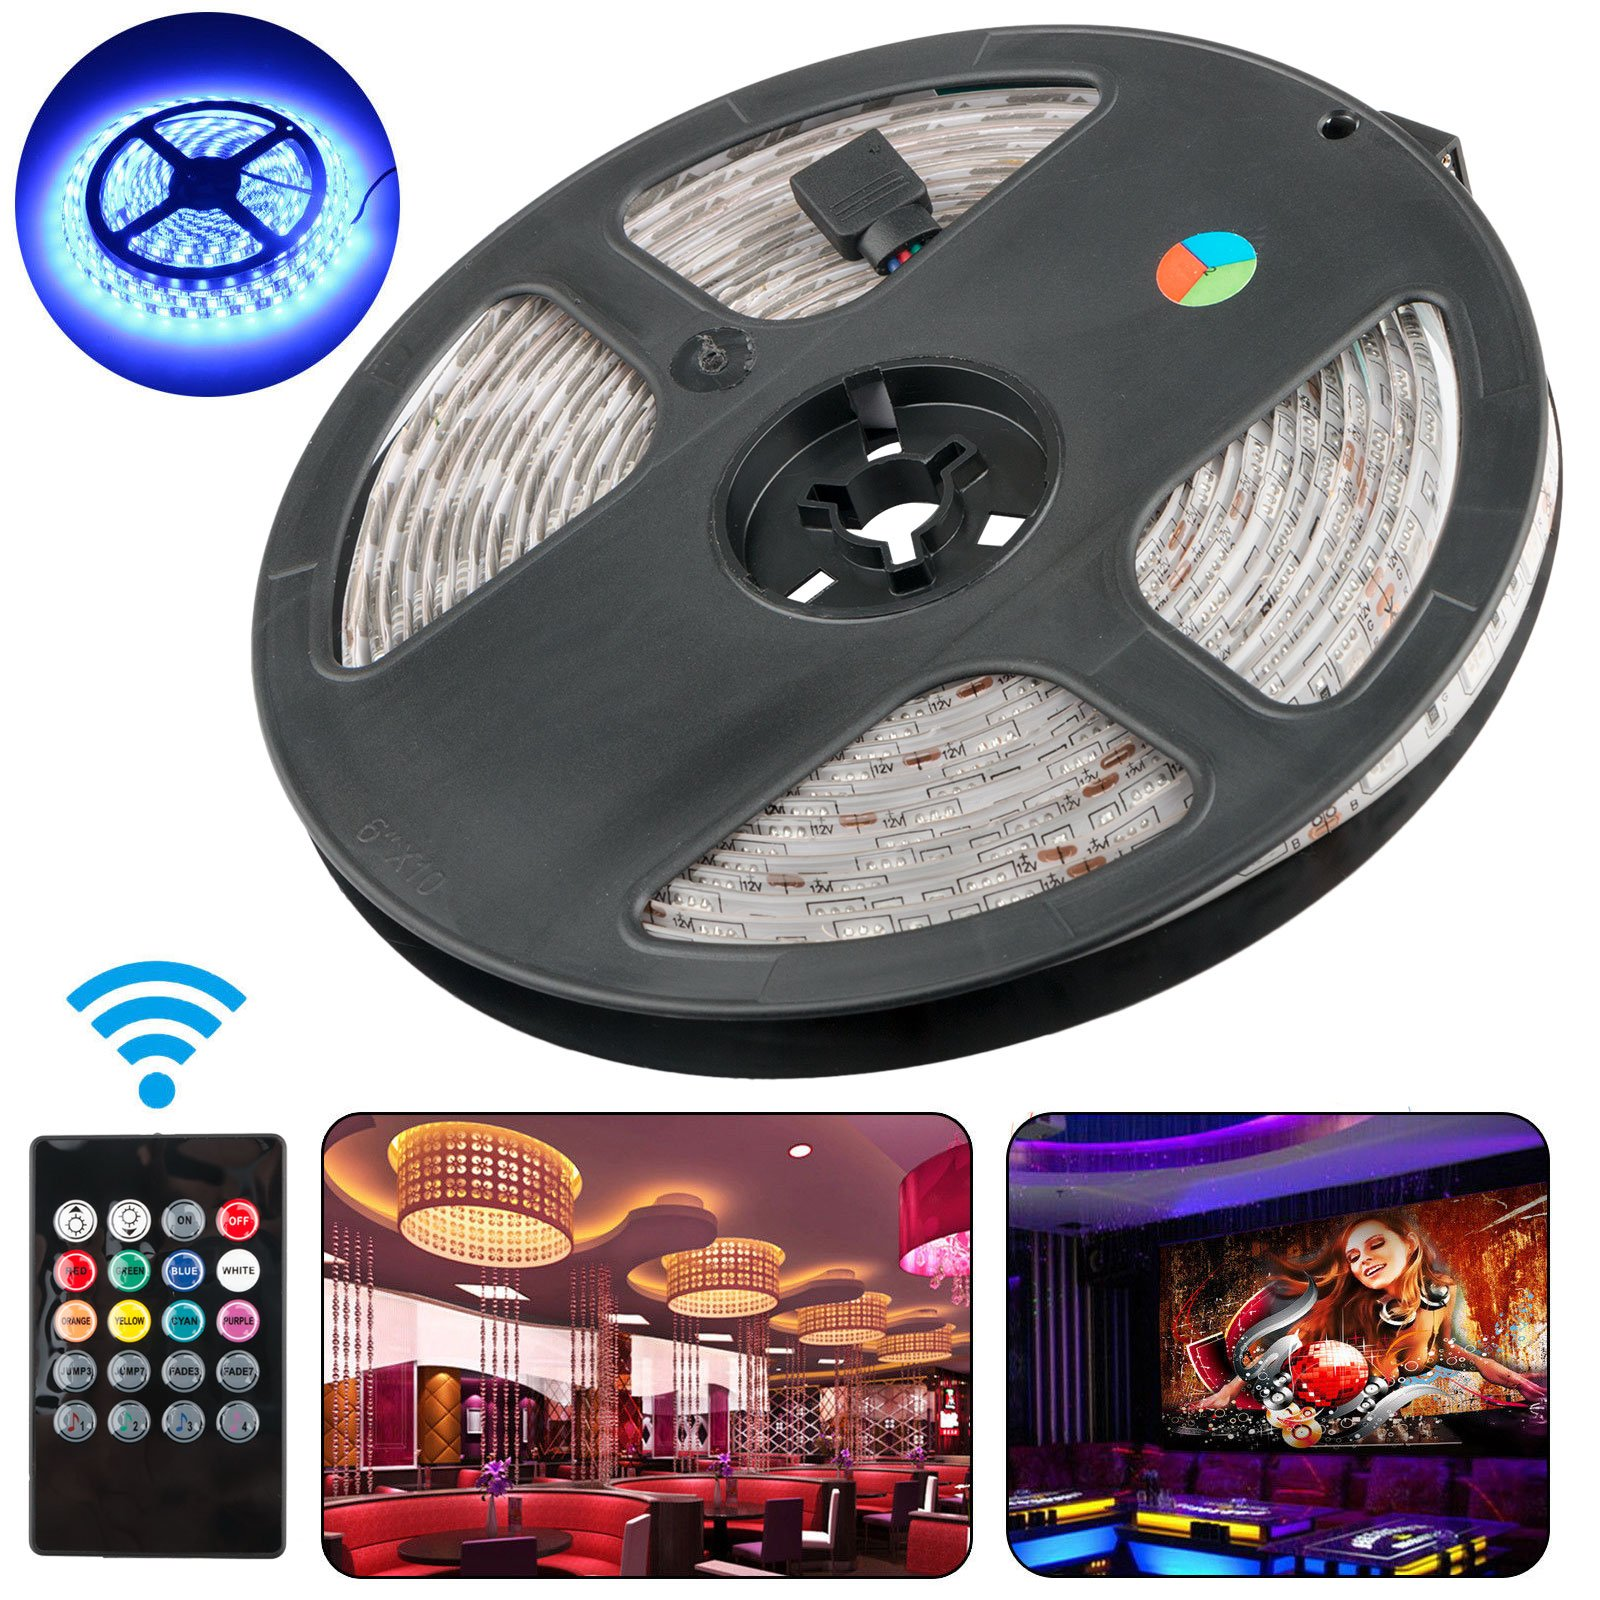 LED Strip Lights, EEEKit 16.4Ft/5M LED Light Strip 300 LED Lights SMD 5050 Waterproof Flexible RGB Strip Lights IR Controller+12V 3A Power